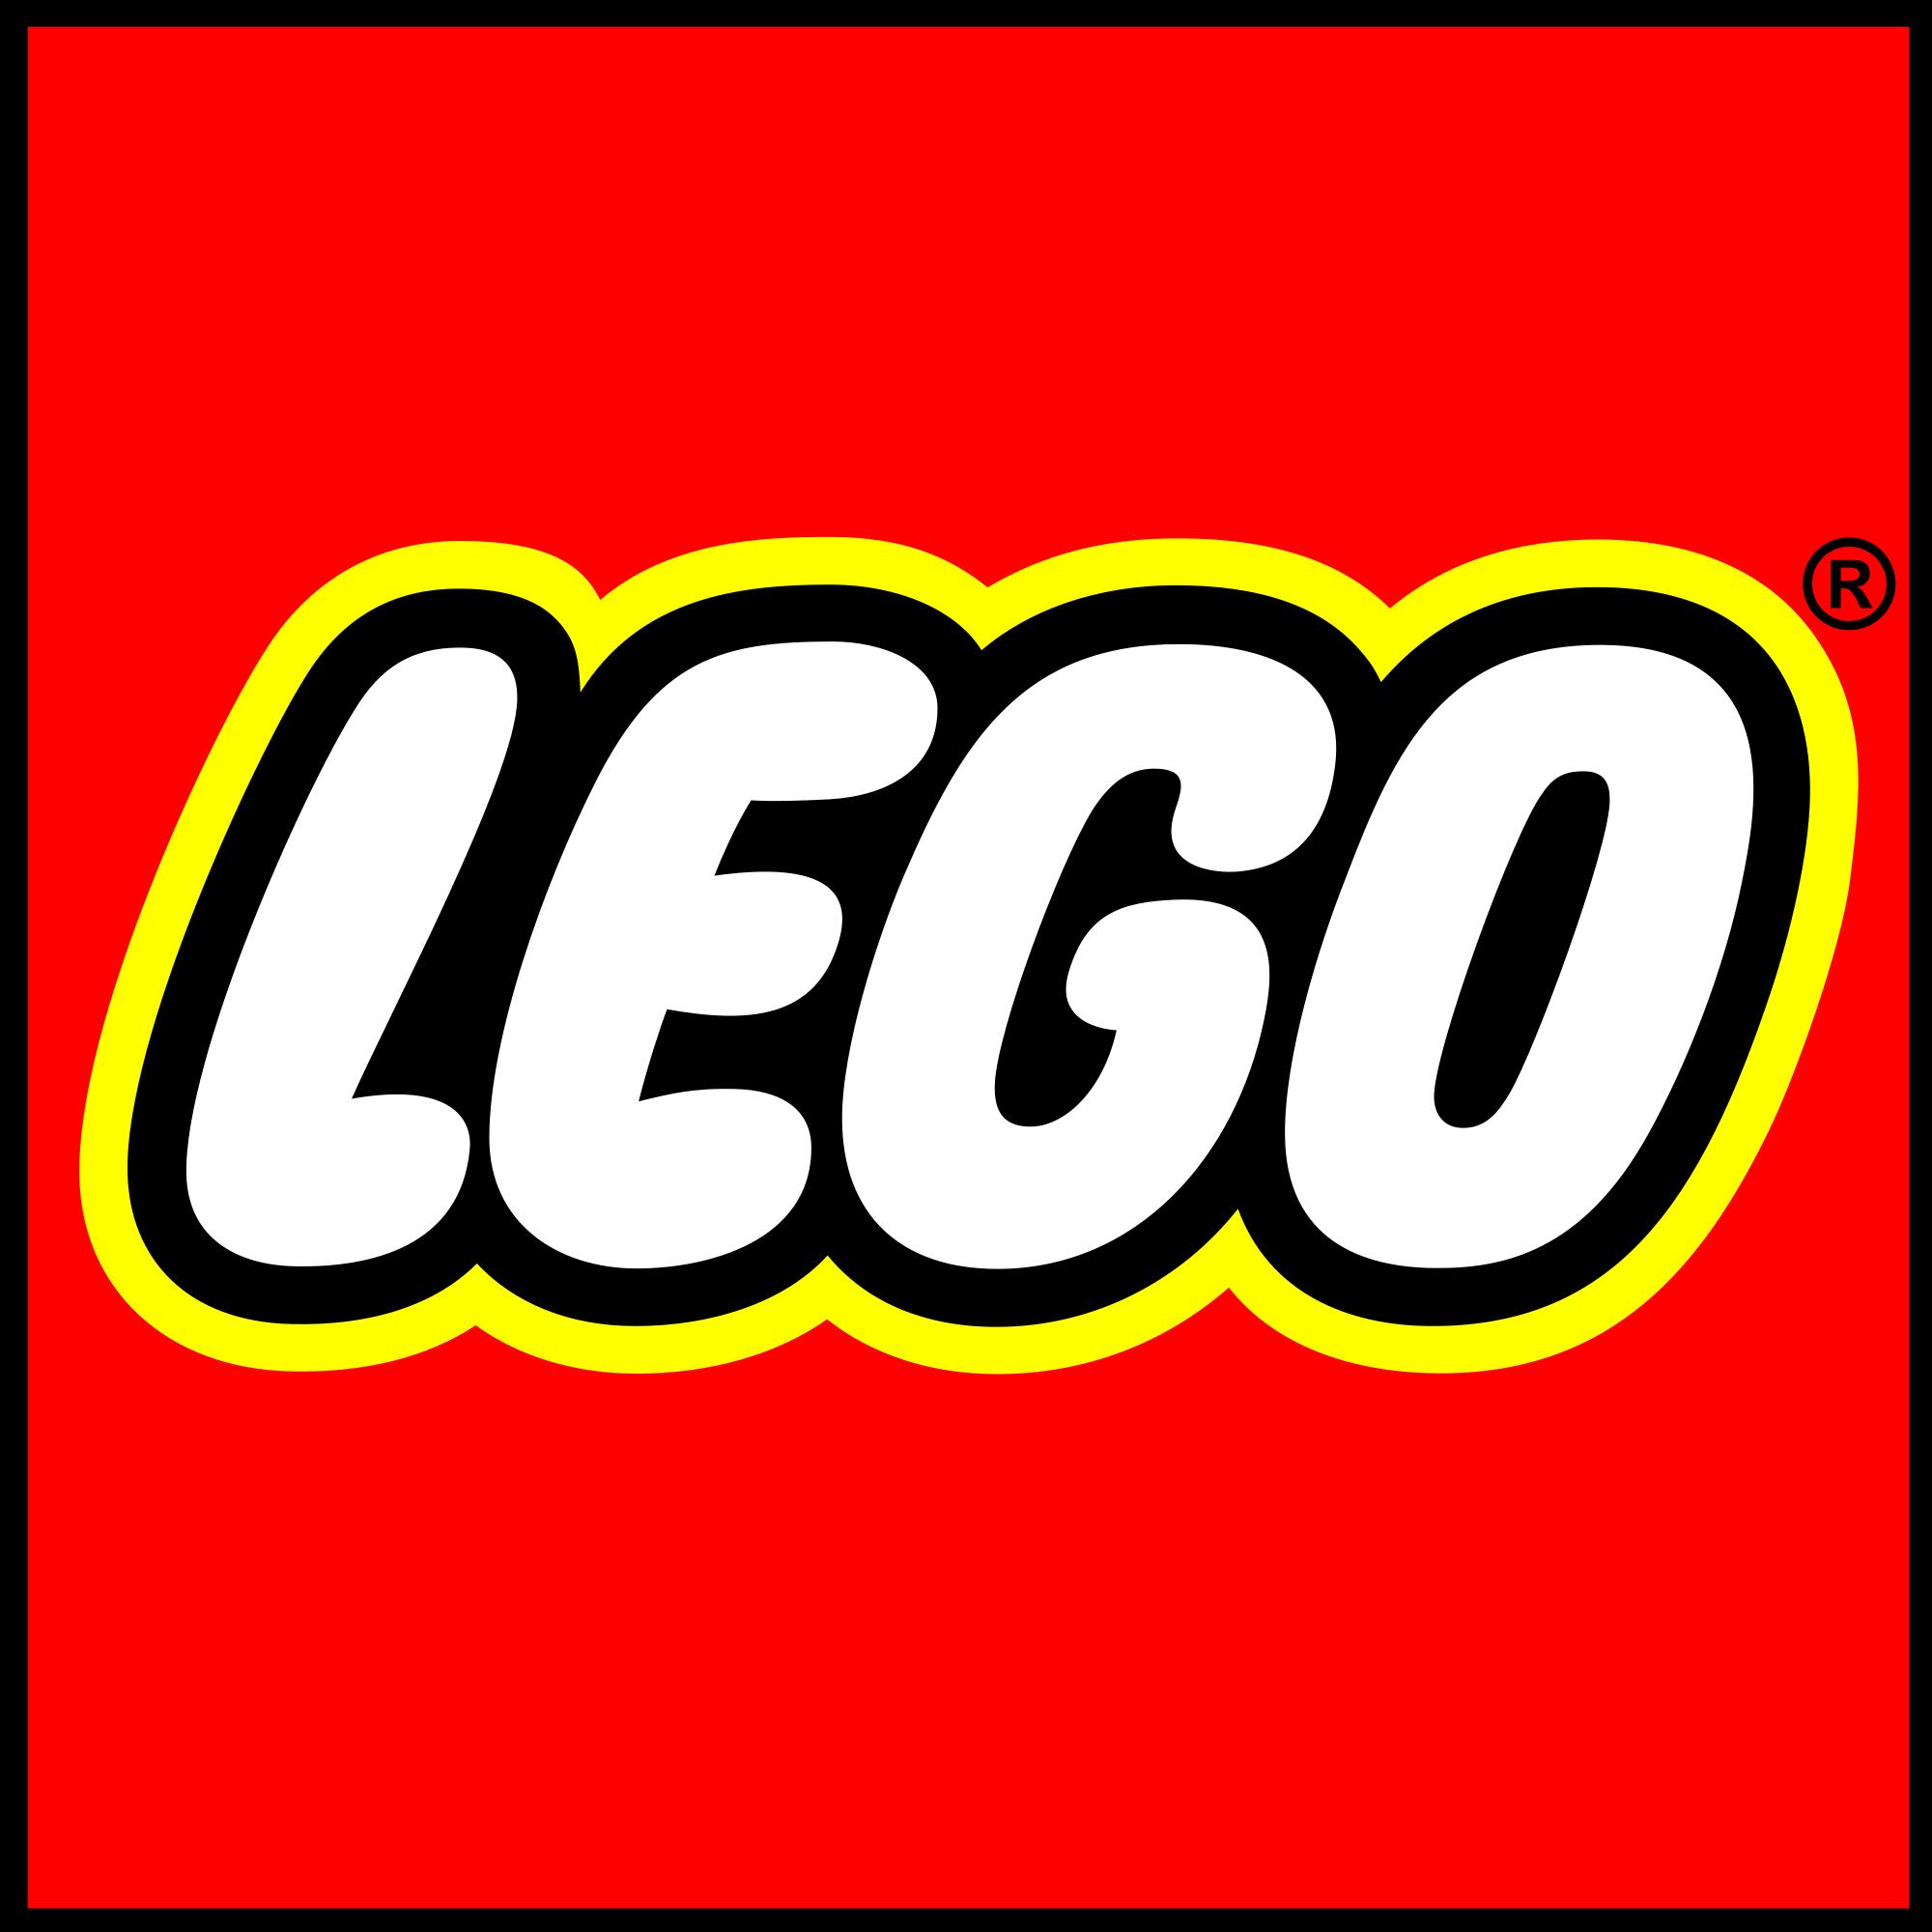 Producent Lego